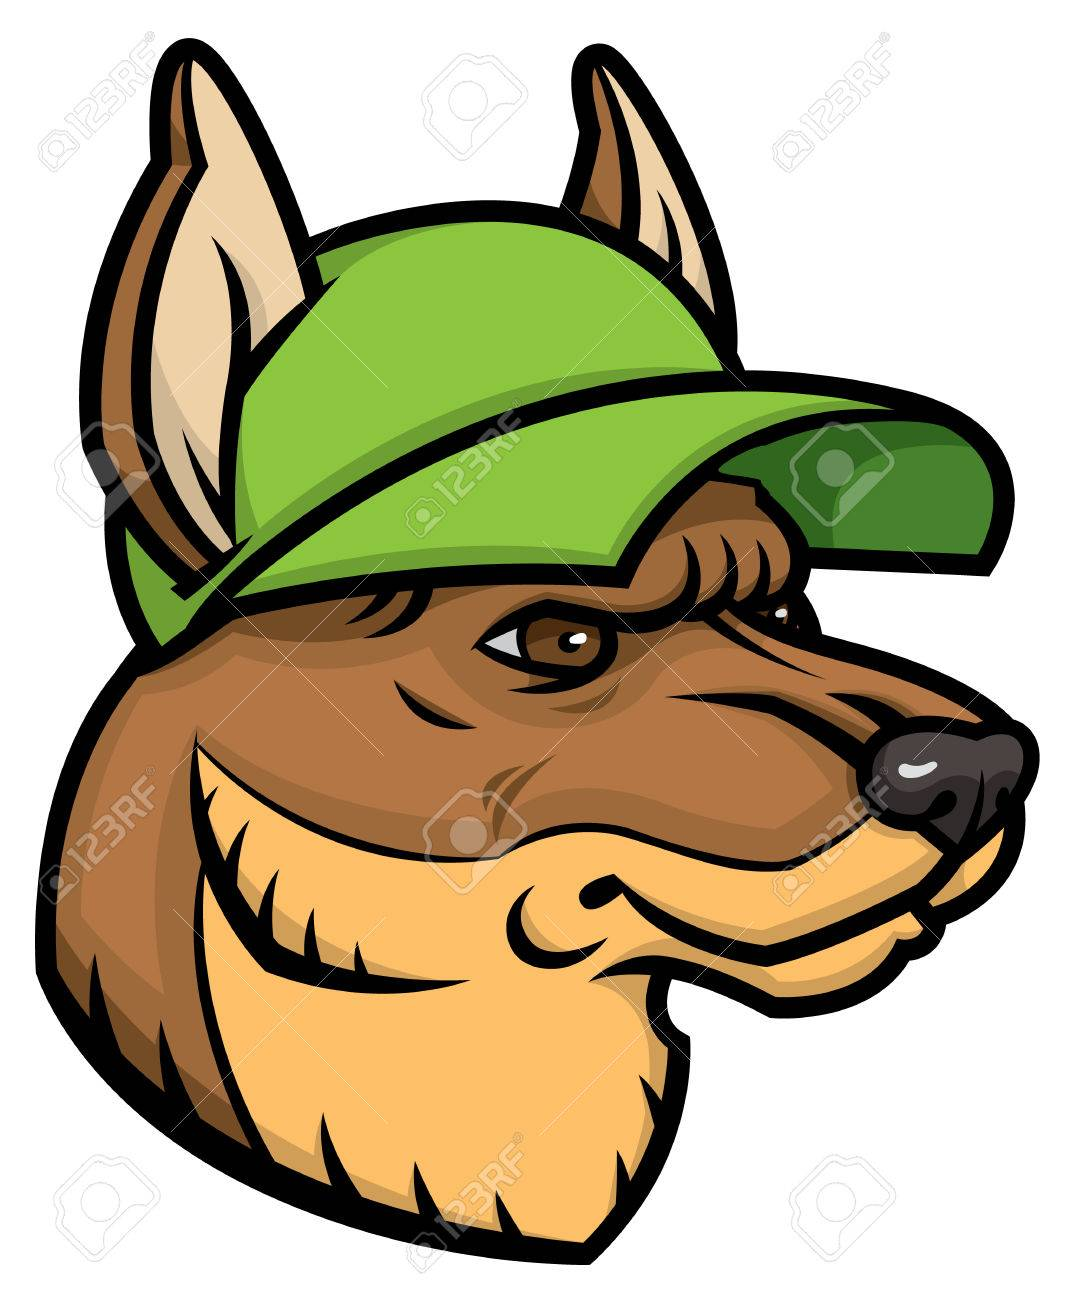 german shepherd head logo mascot emblem royalty free cliparts rh 123rf com german shepherd looks skinny german shepherd looks skinny